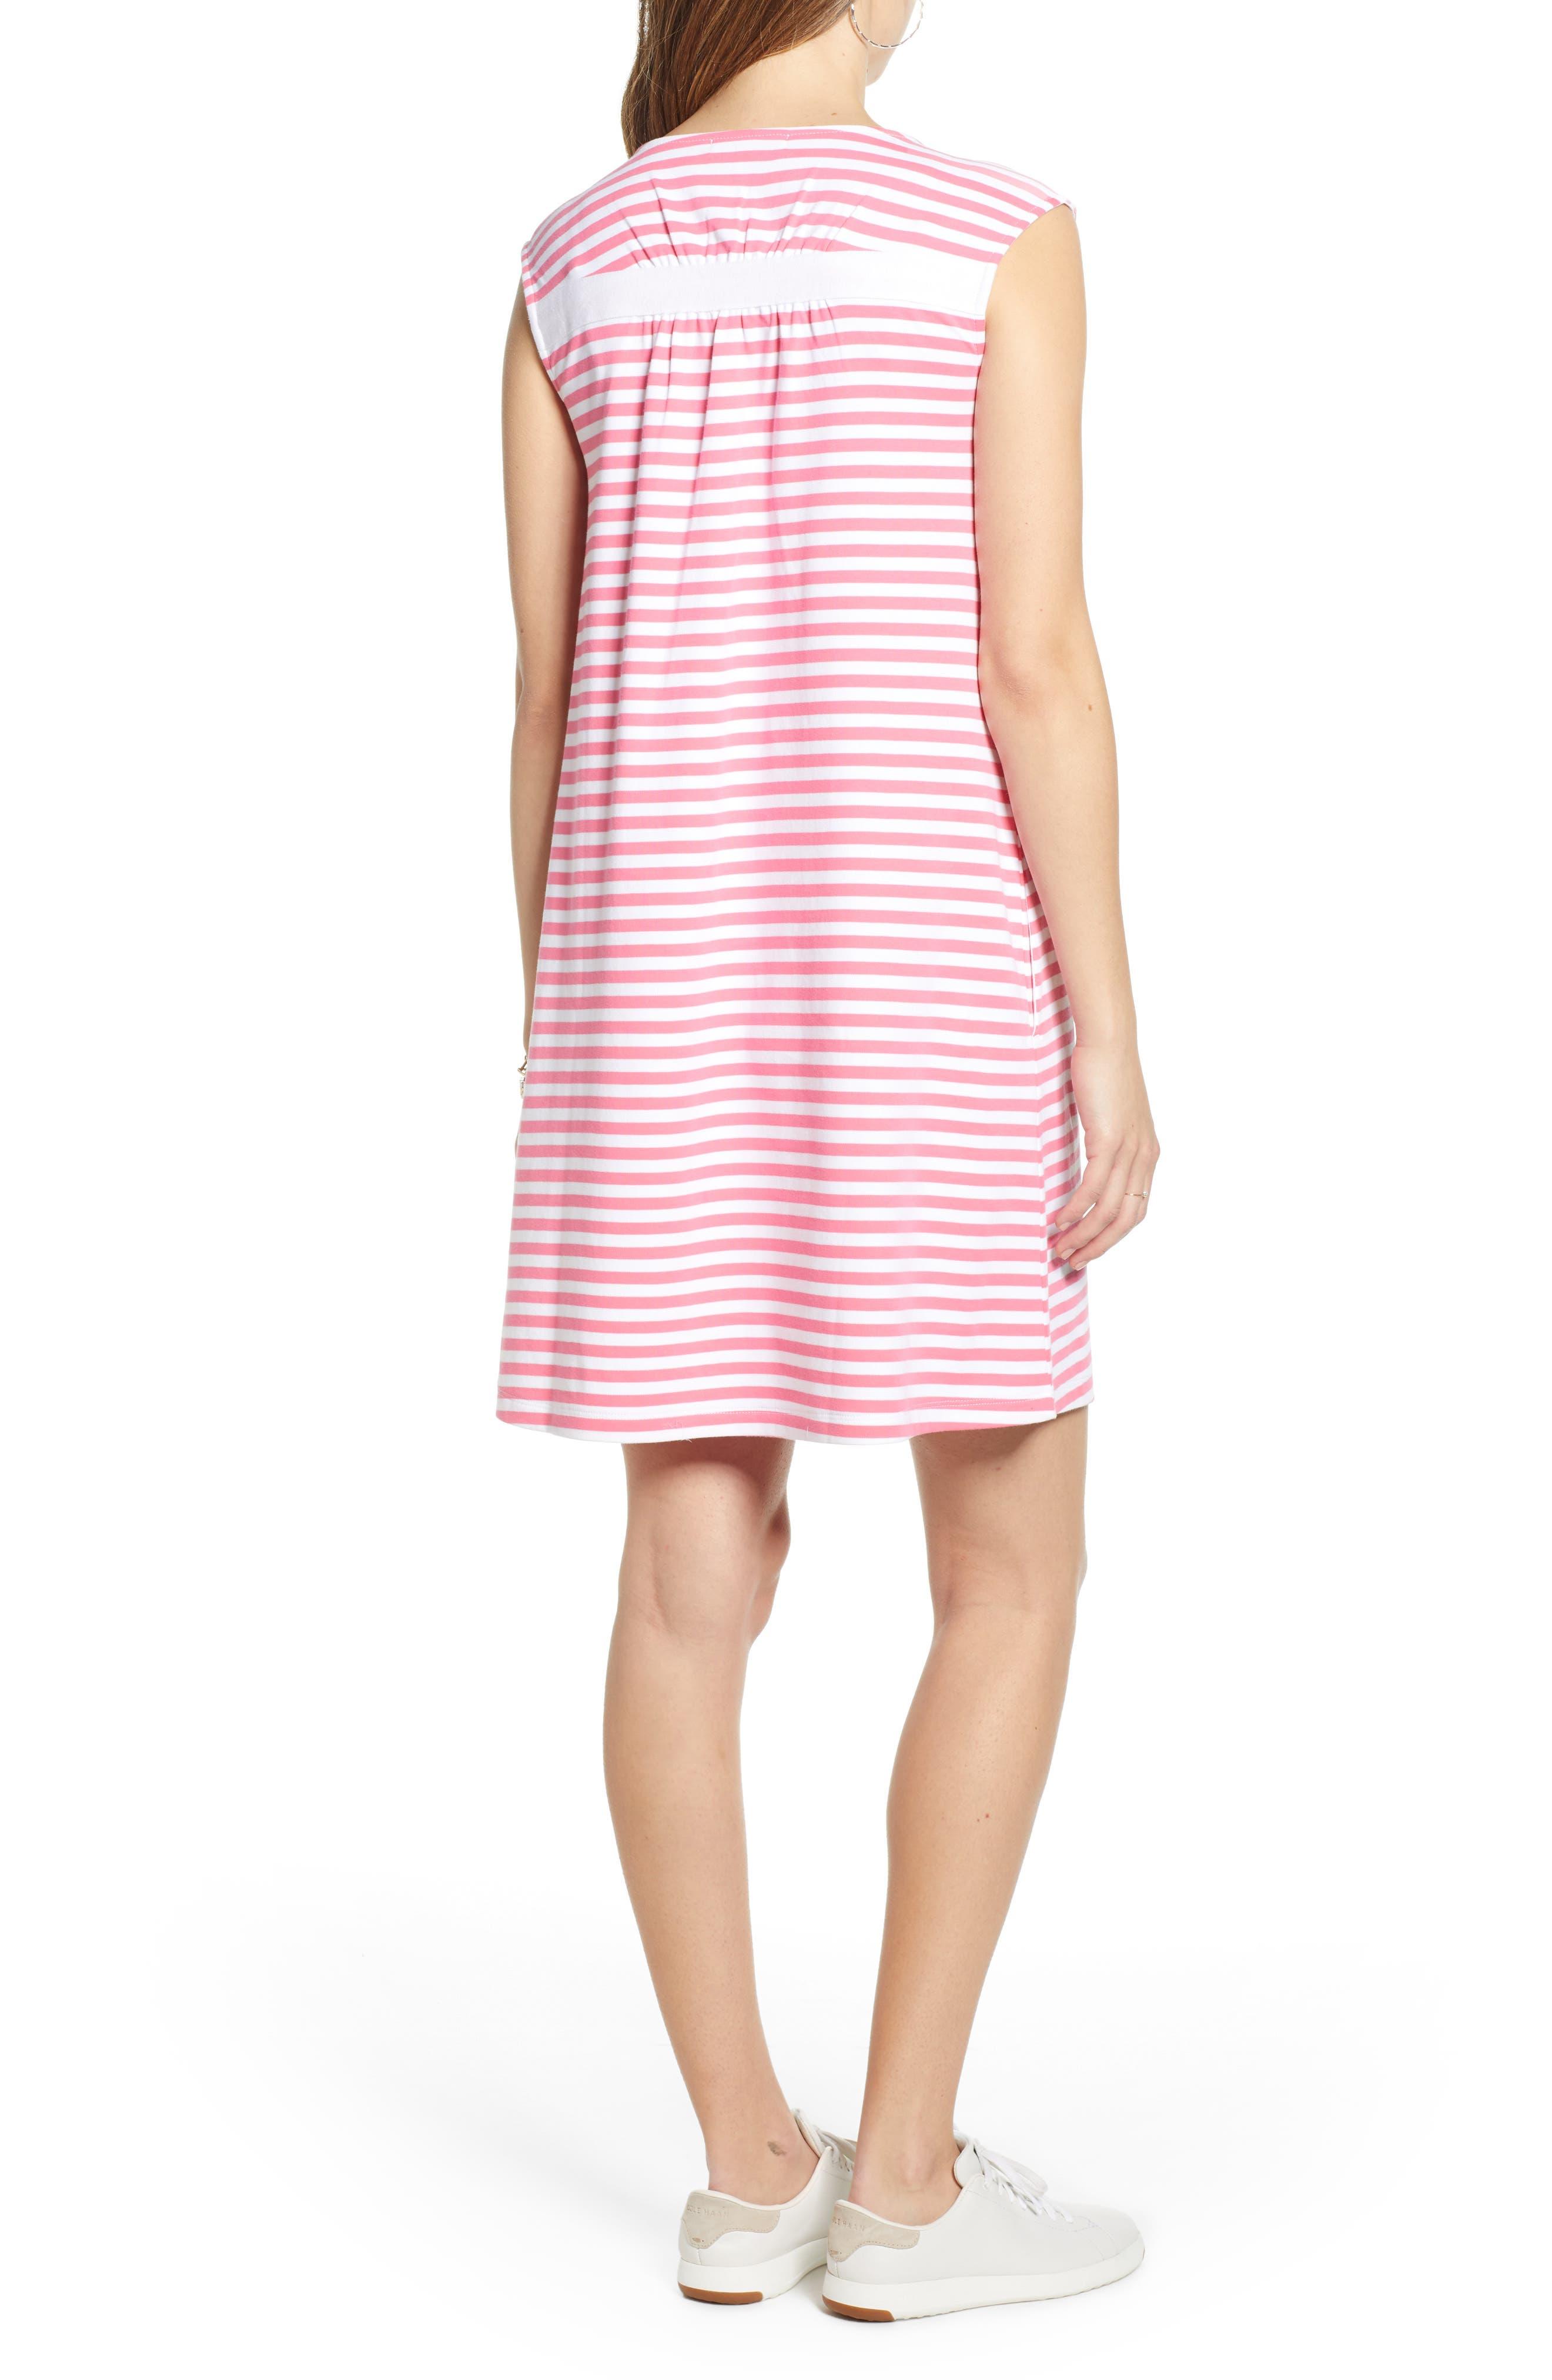 3fccfdb1d90 striped dress | Nordstrom